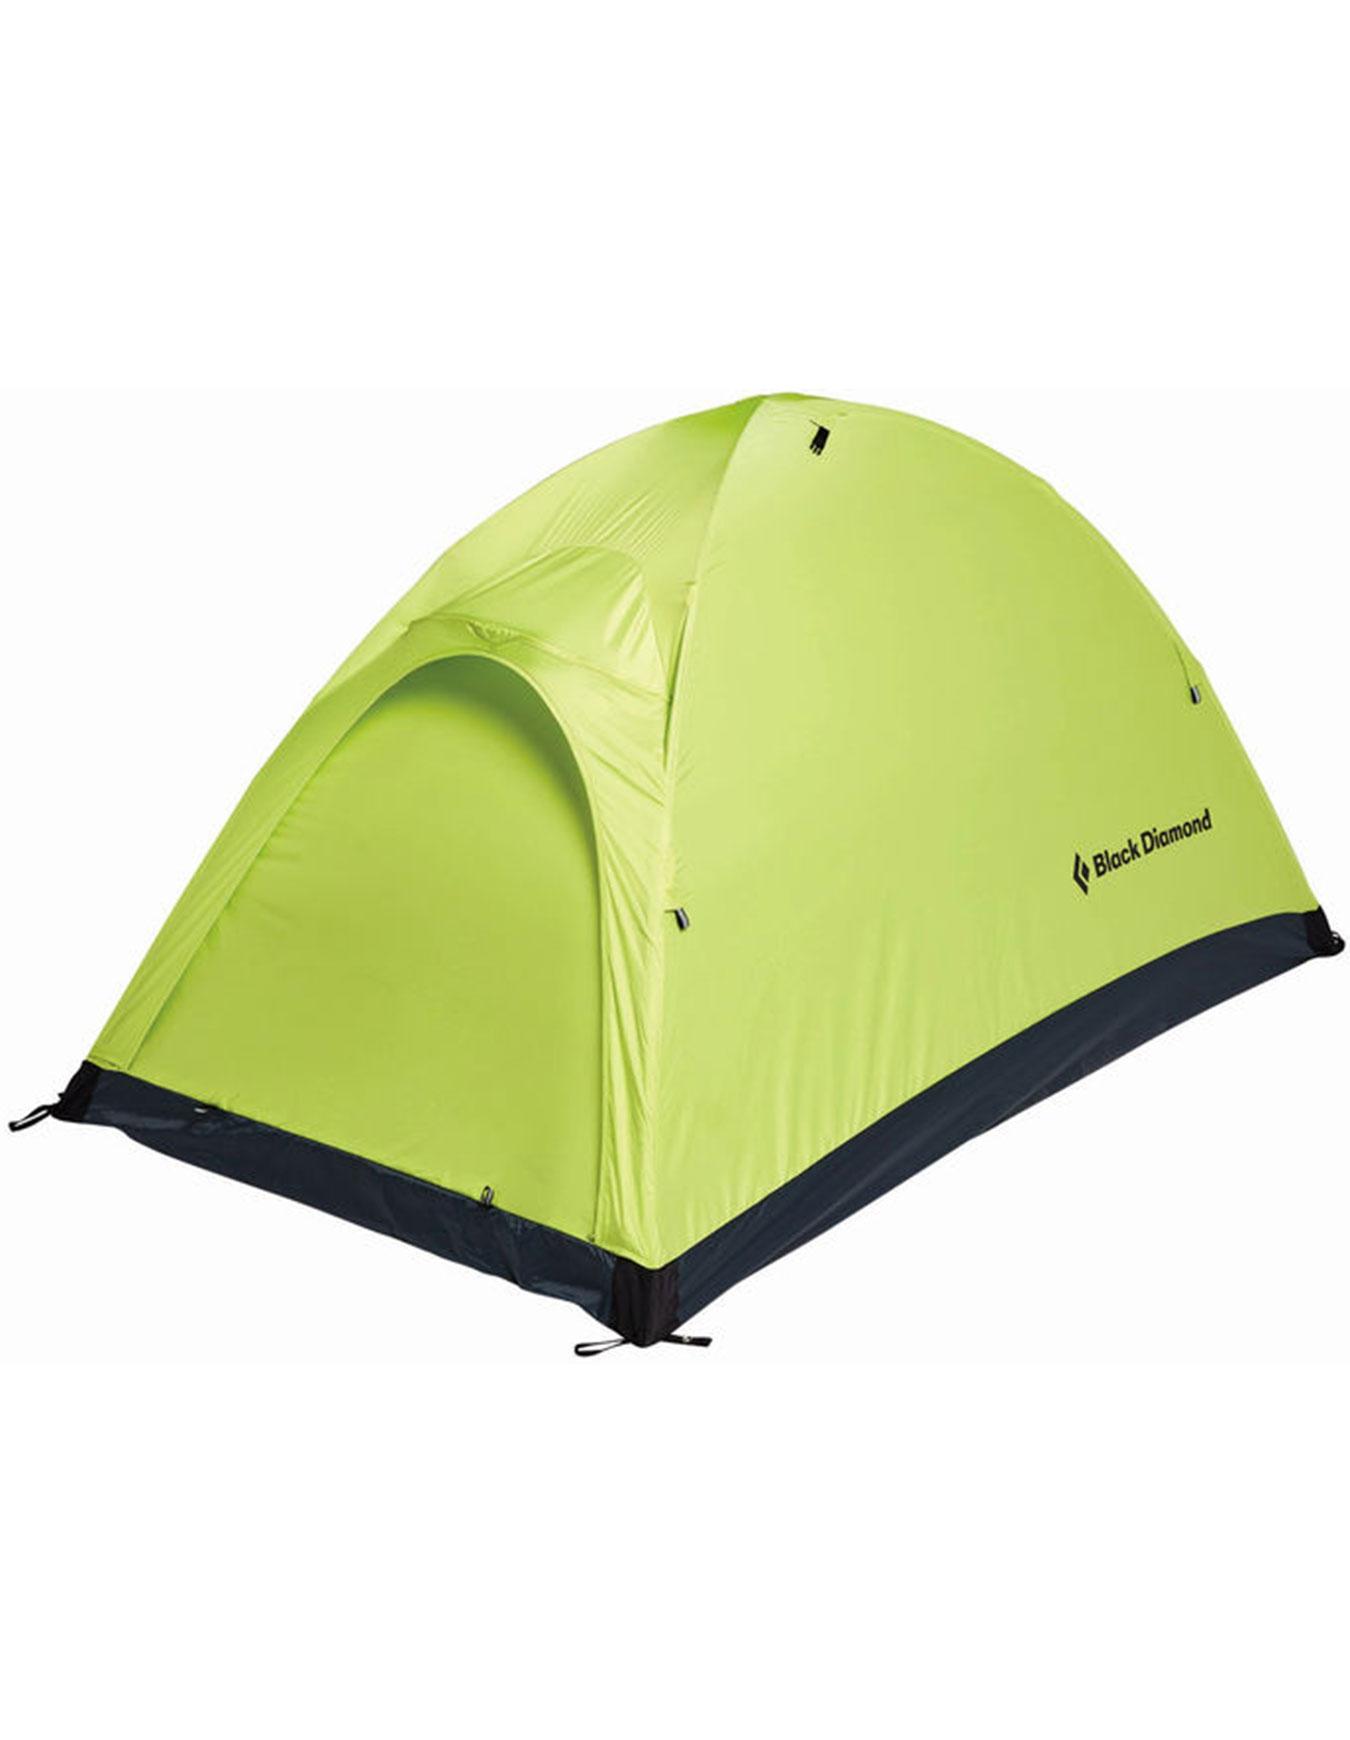 black diamond firstlight 2 person ultralight tent